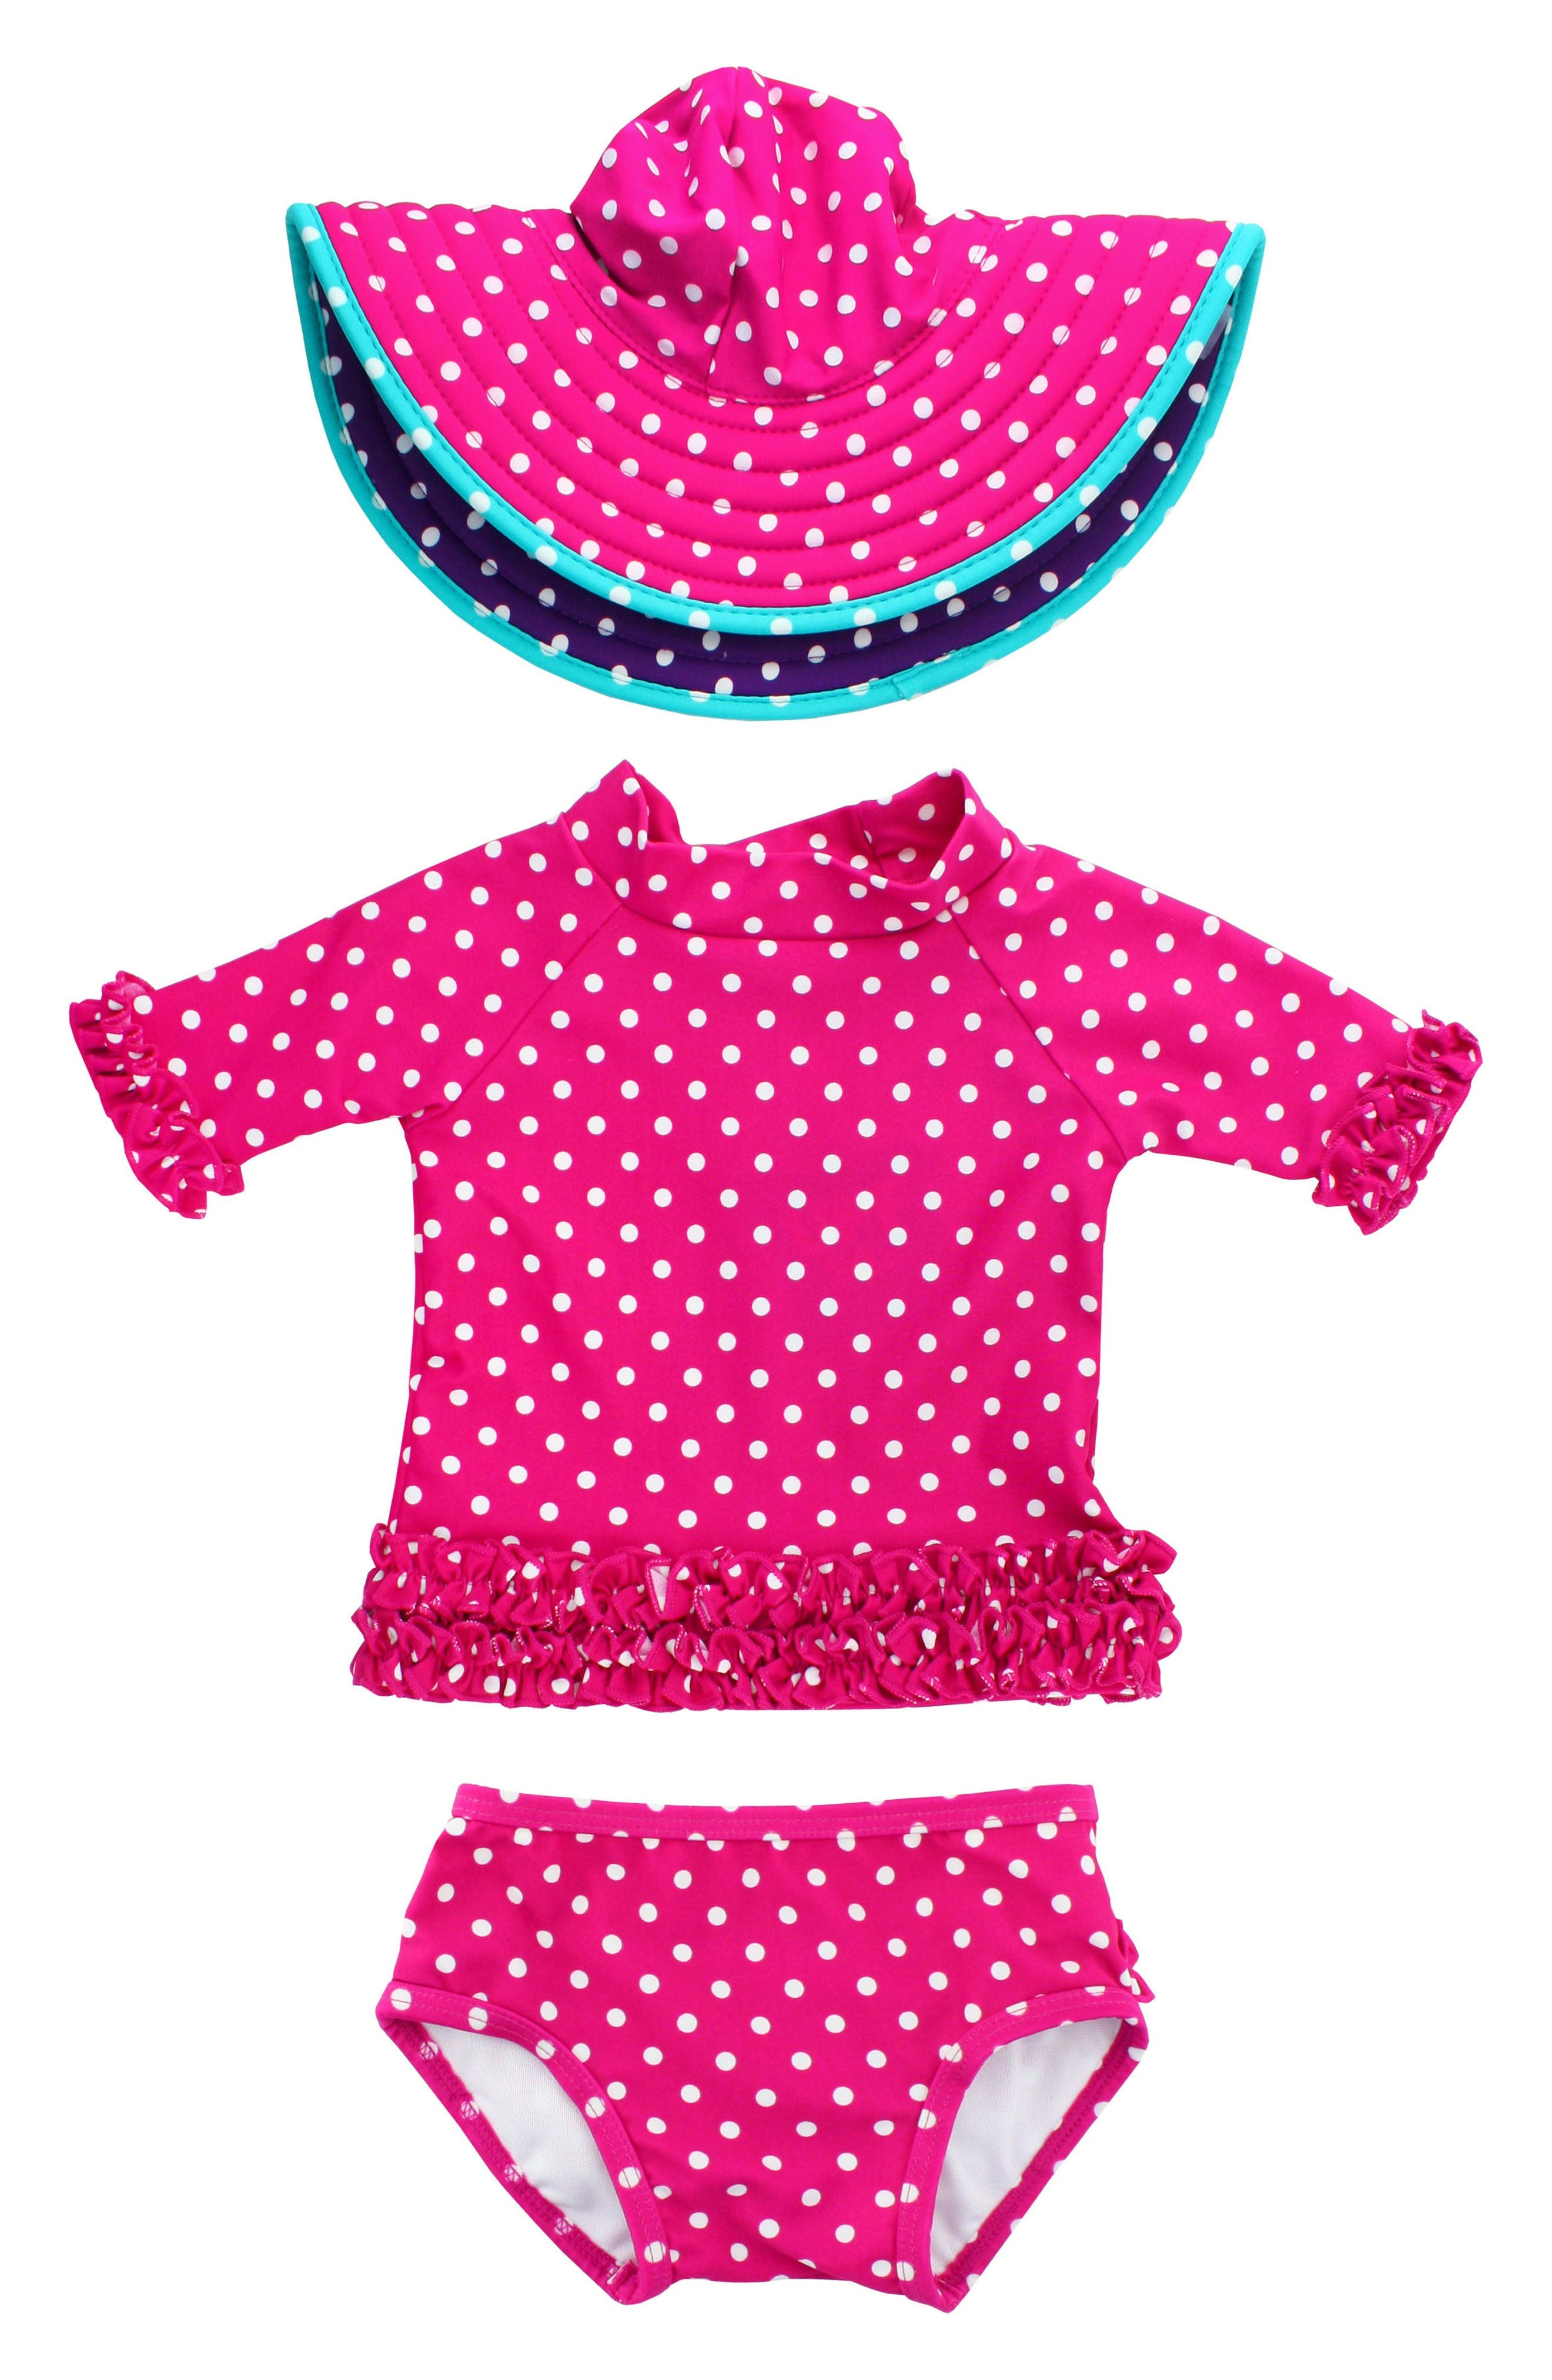 Main Image - RuffleButts Two-Piece Rashguard Swimsuit & Hat Set (Baby Girls)